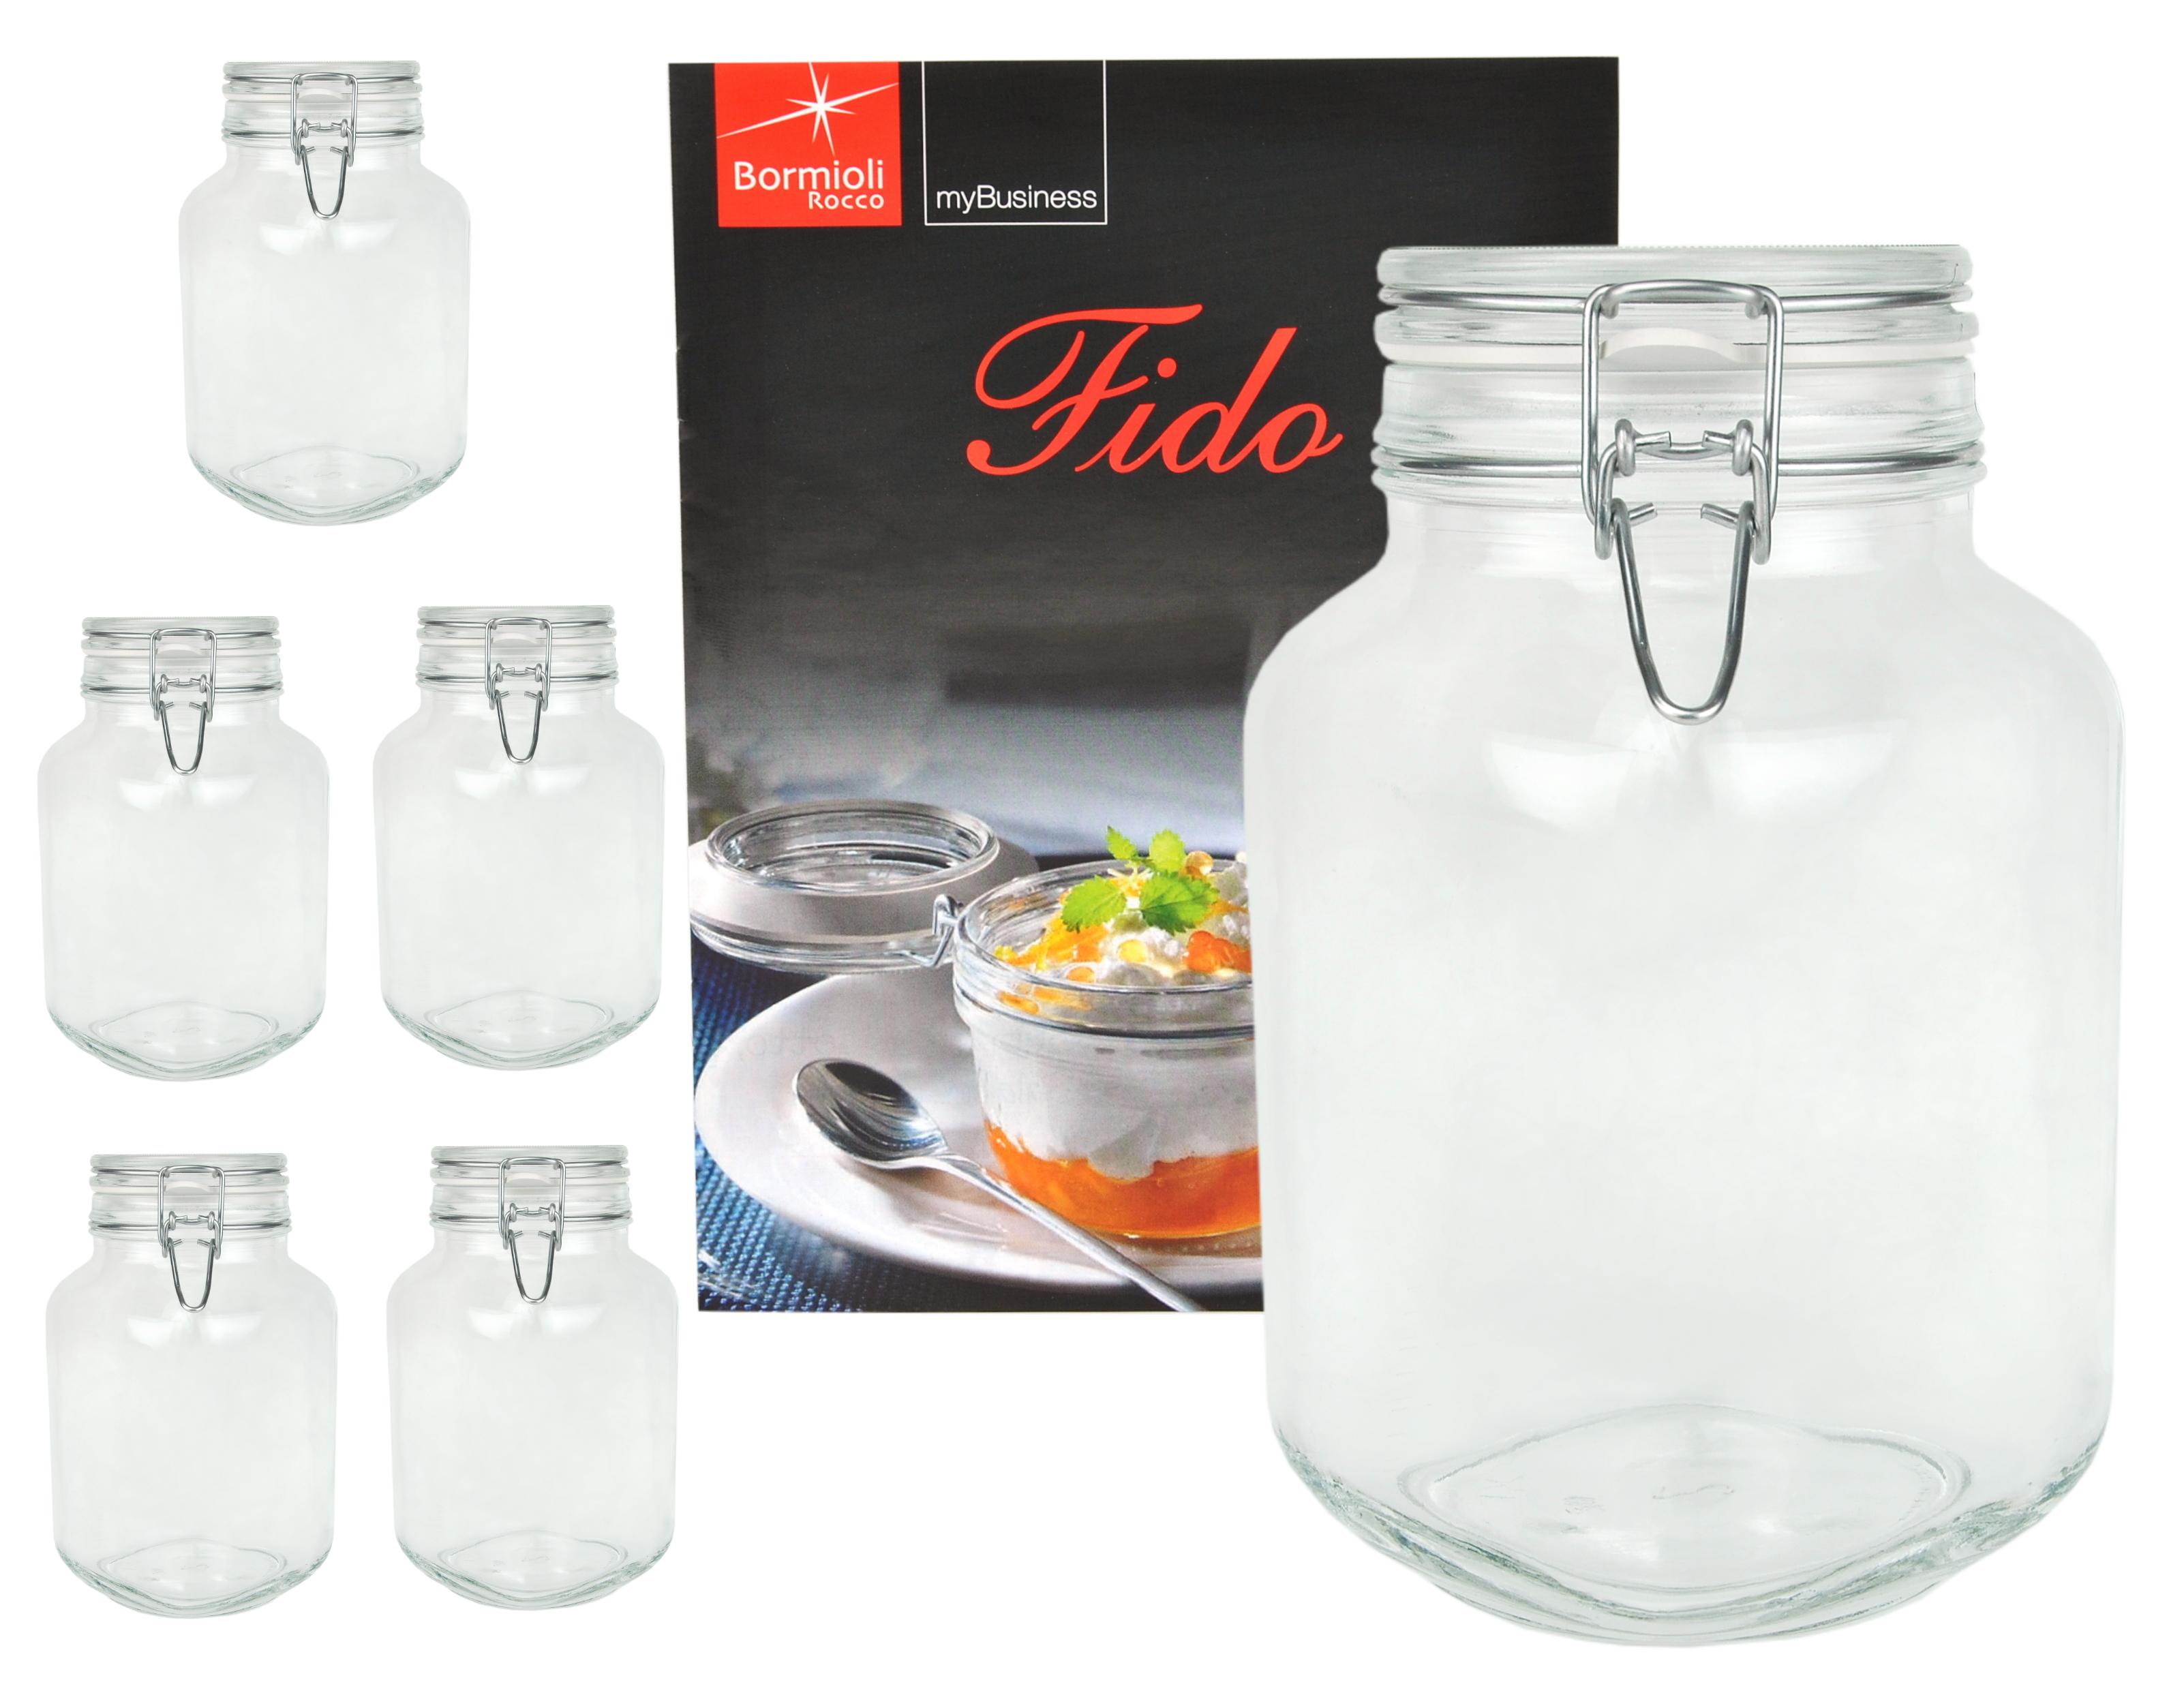 6er set einmachglas eimachgl ser fido 3l 3000ml vorratsglas rezeptheft ebay. Black Bedroom Furniture Sets. Home Design Ideas